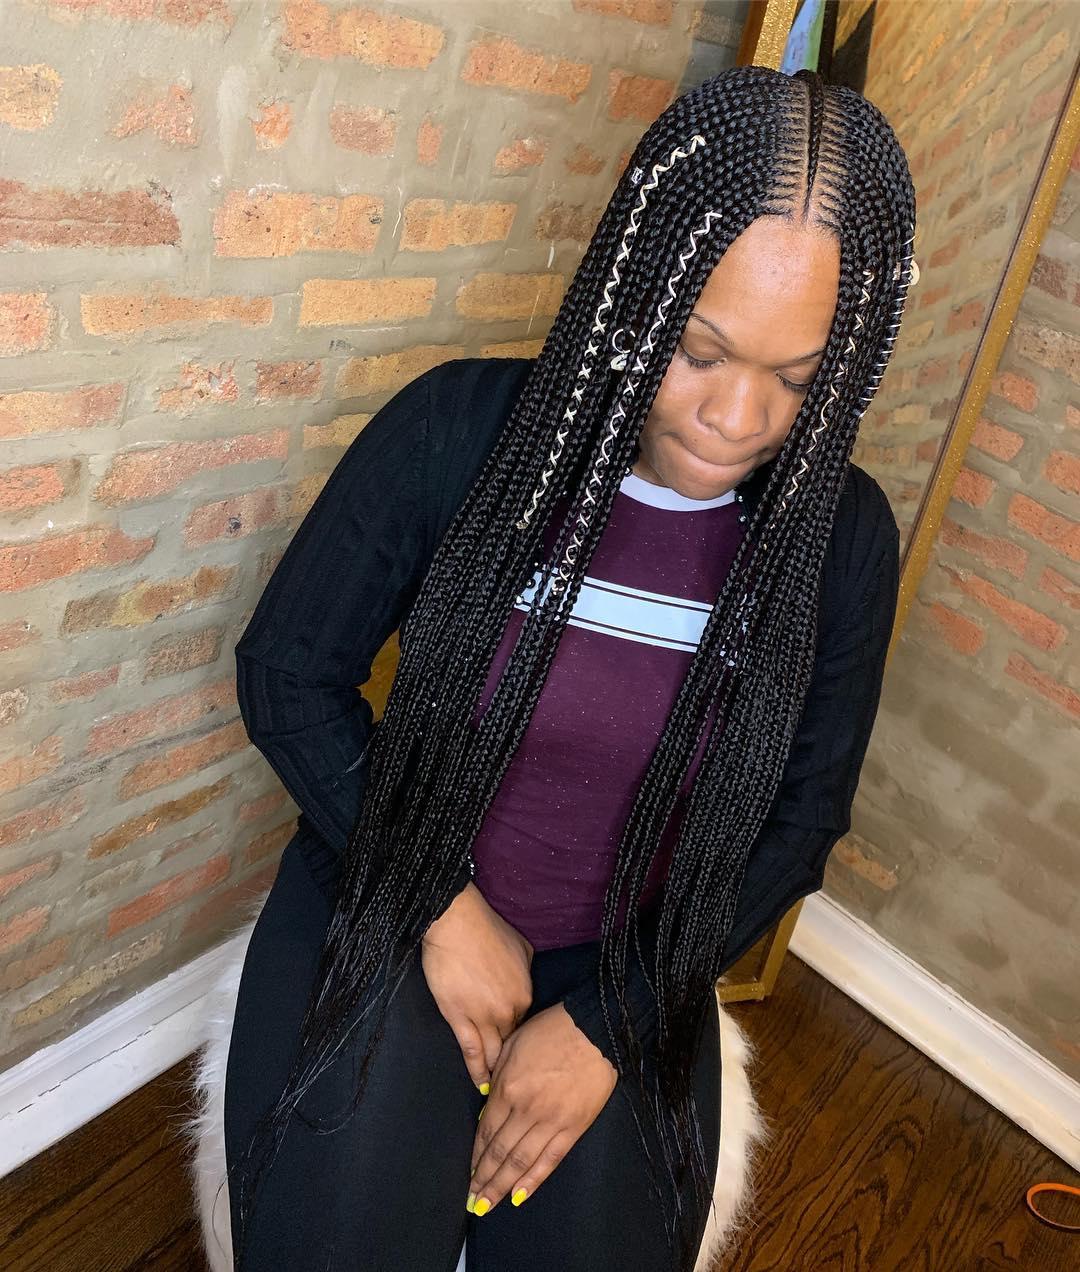 32 Cute Feed In Braids Hairstyles Ways To Rock In 2019 Styleuki